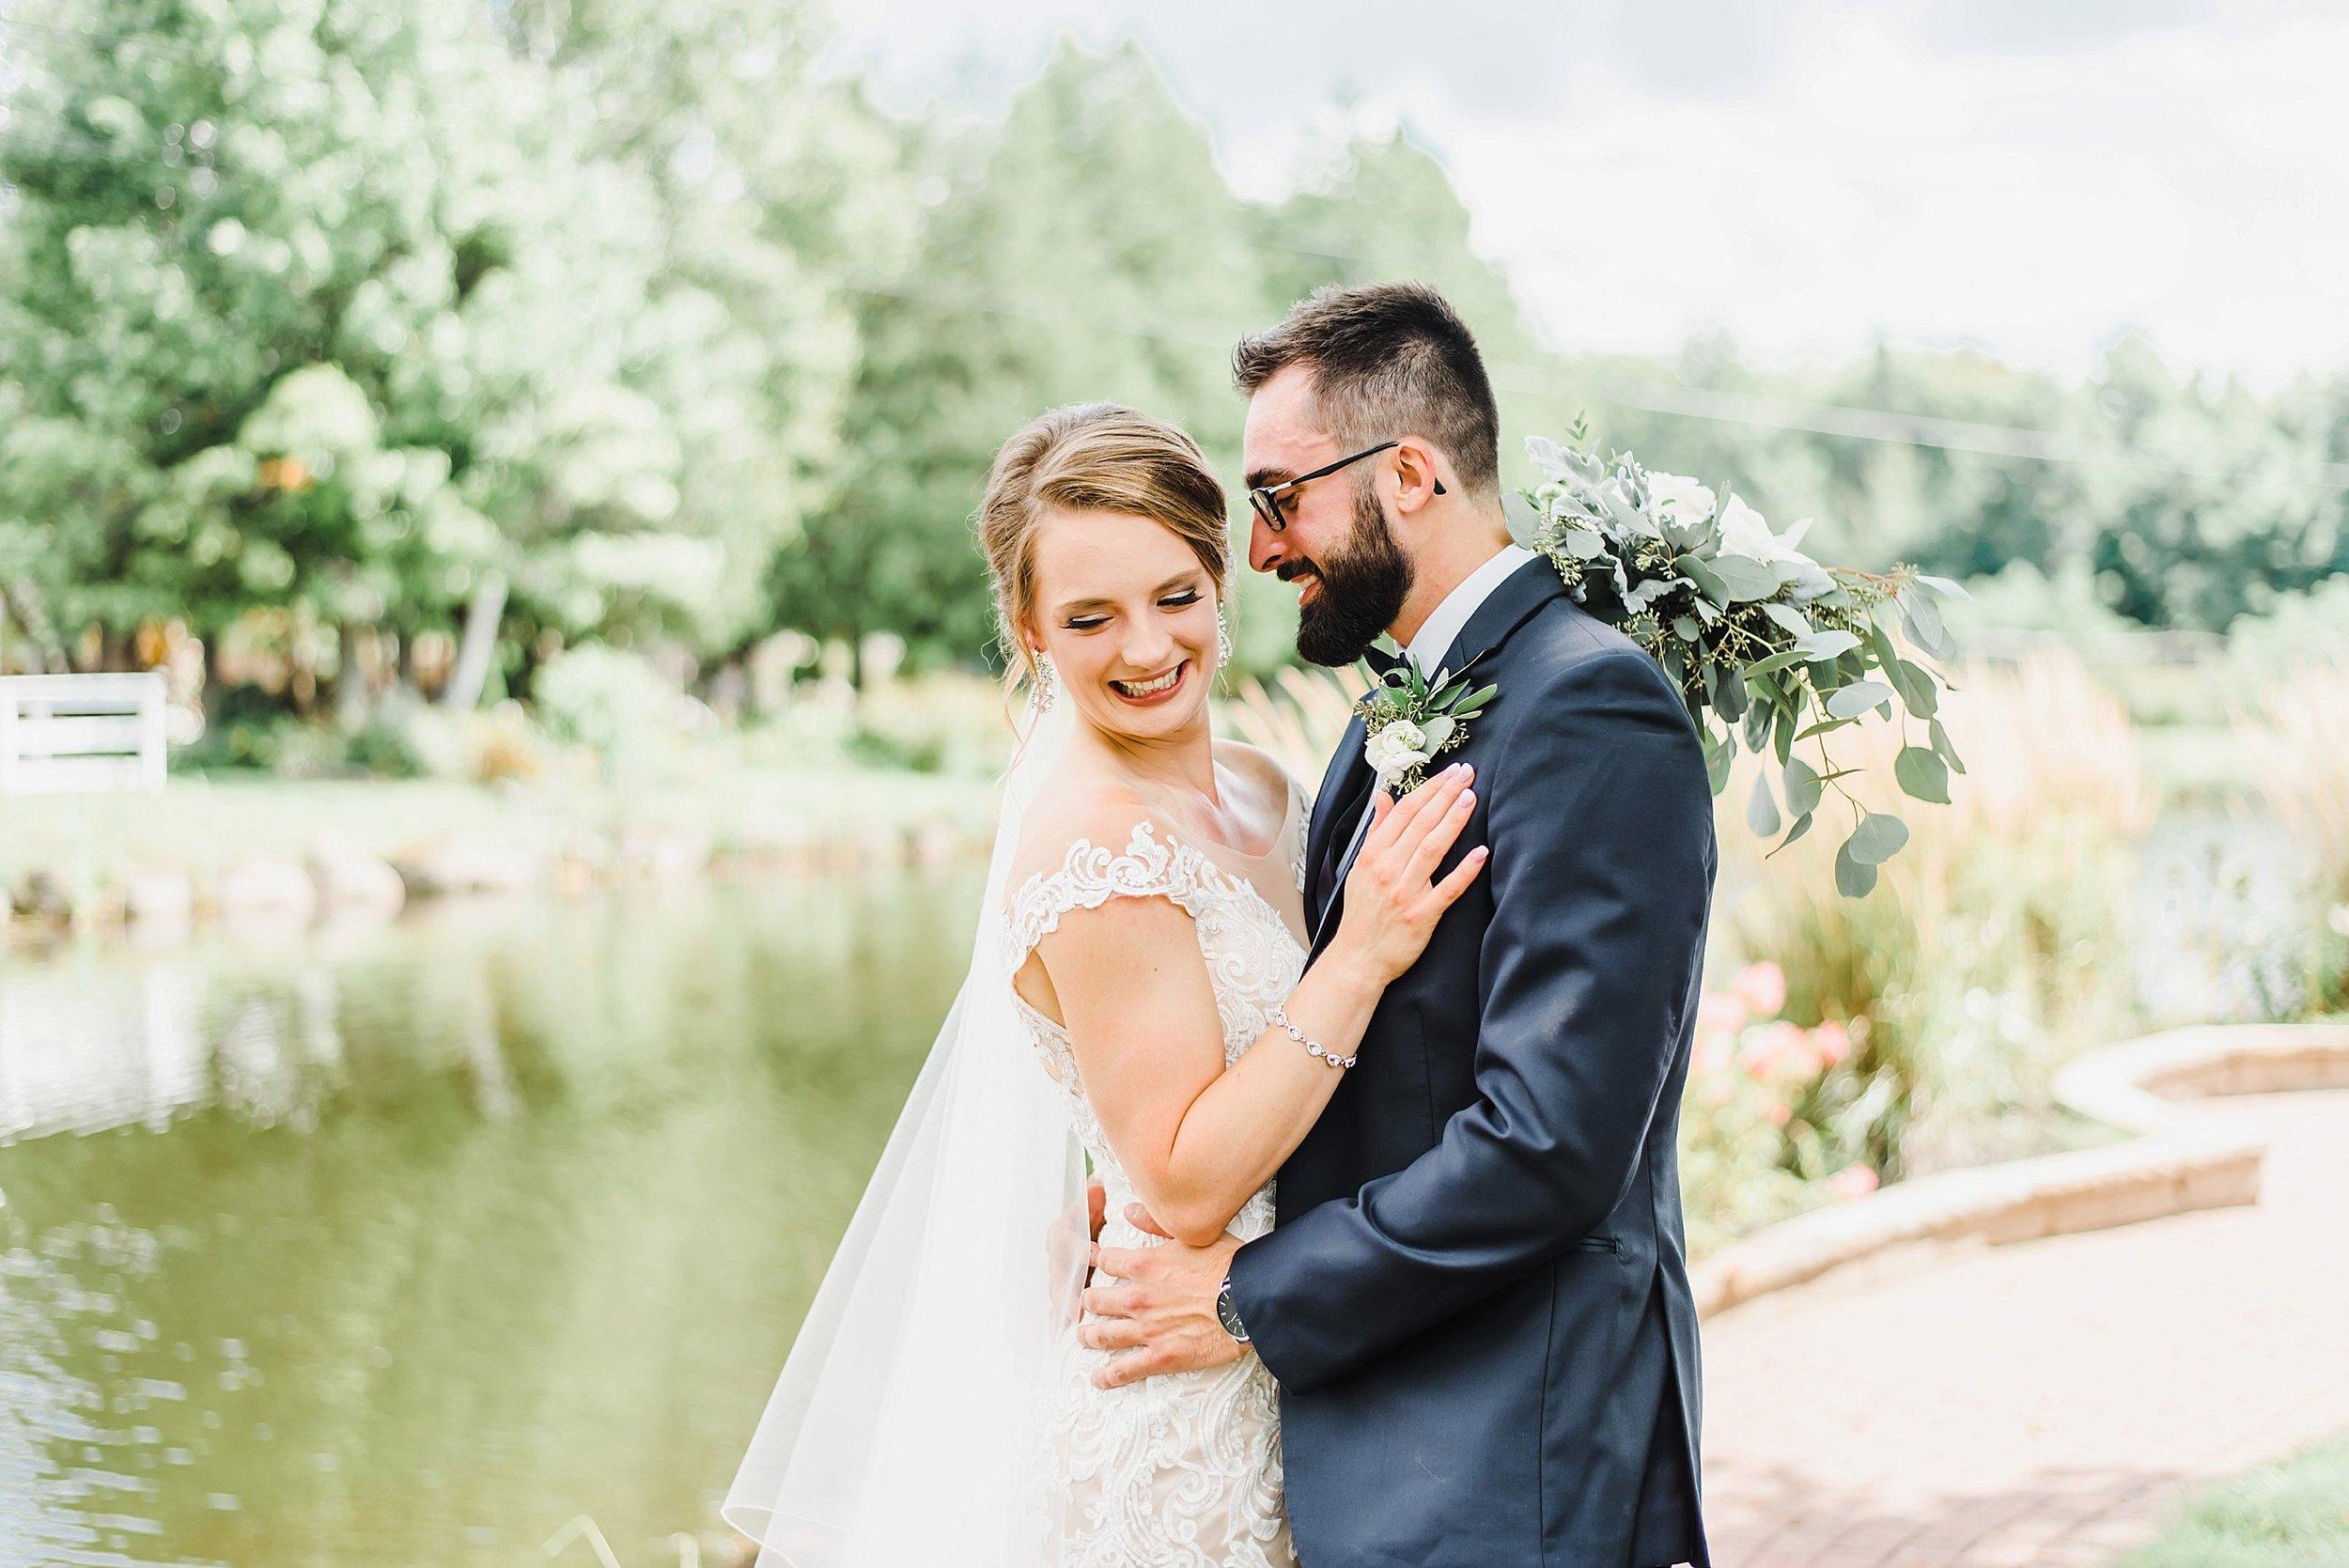 light airy indie fine art ottawa wedding photographer | Ali and Batoul Photography_1250.jpg